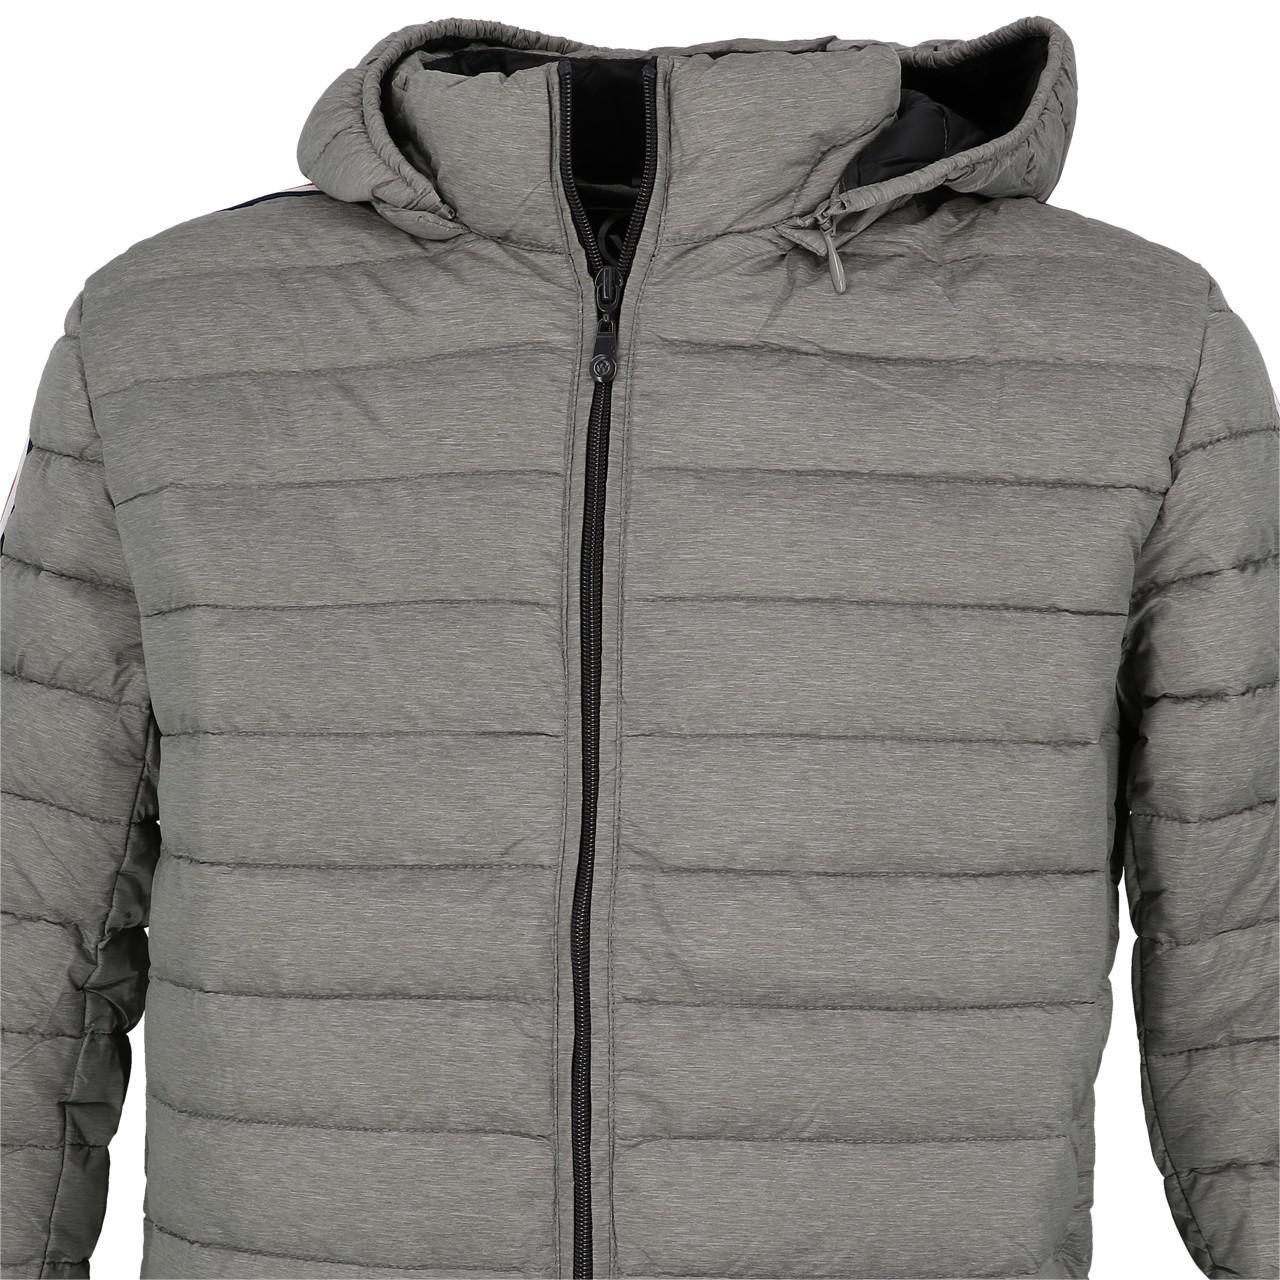 Synthetic-Jackets-Waxx-Shelter-Stripes-Metal-H-Grey-50764-New thumbnail 2